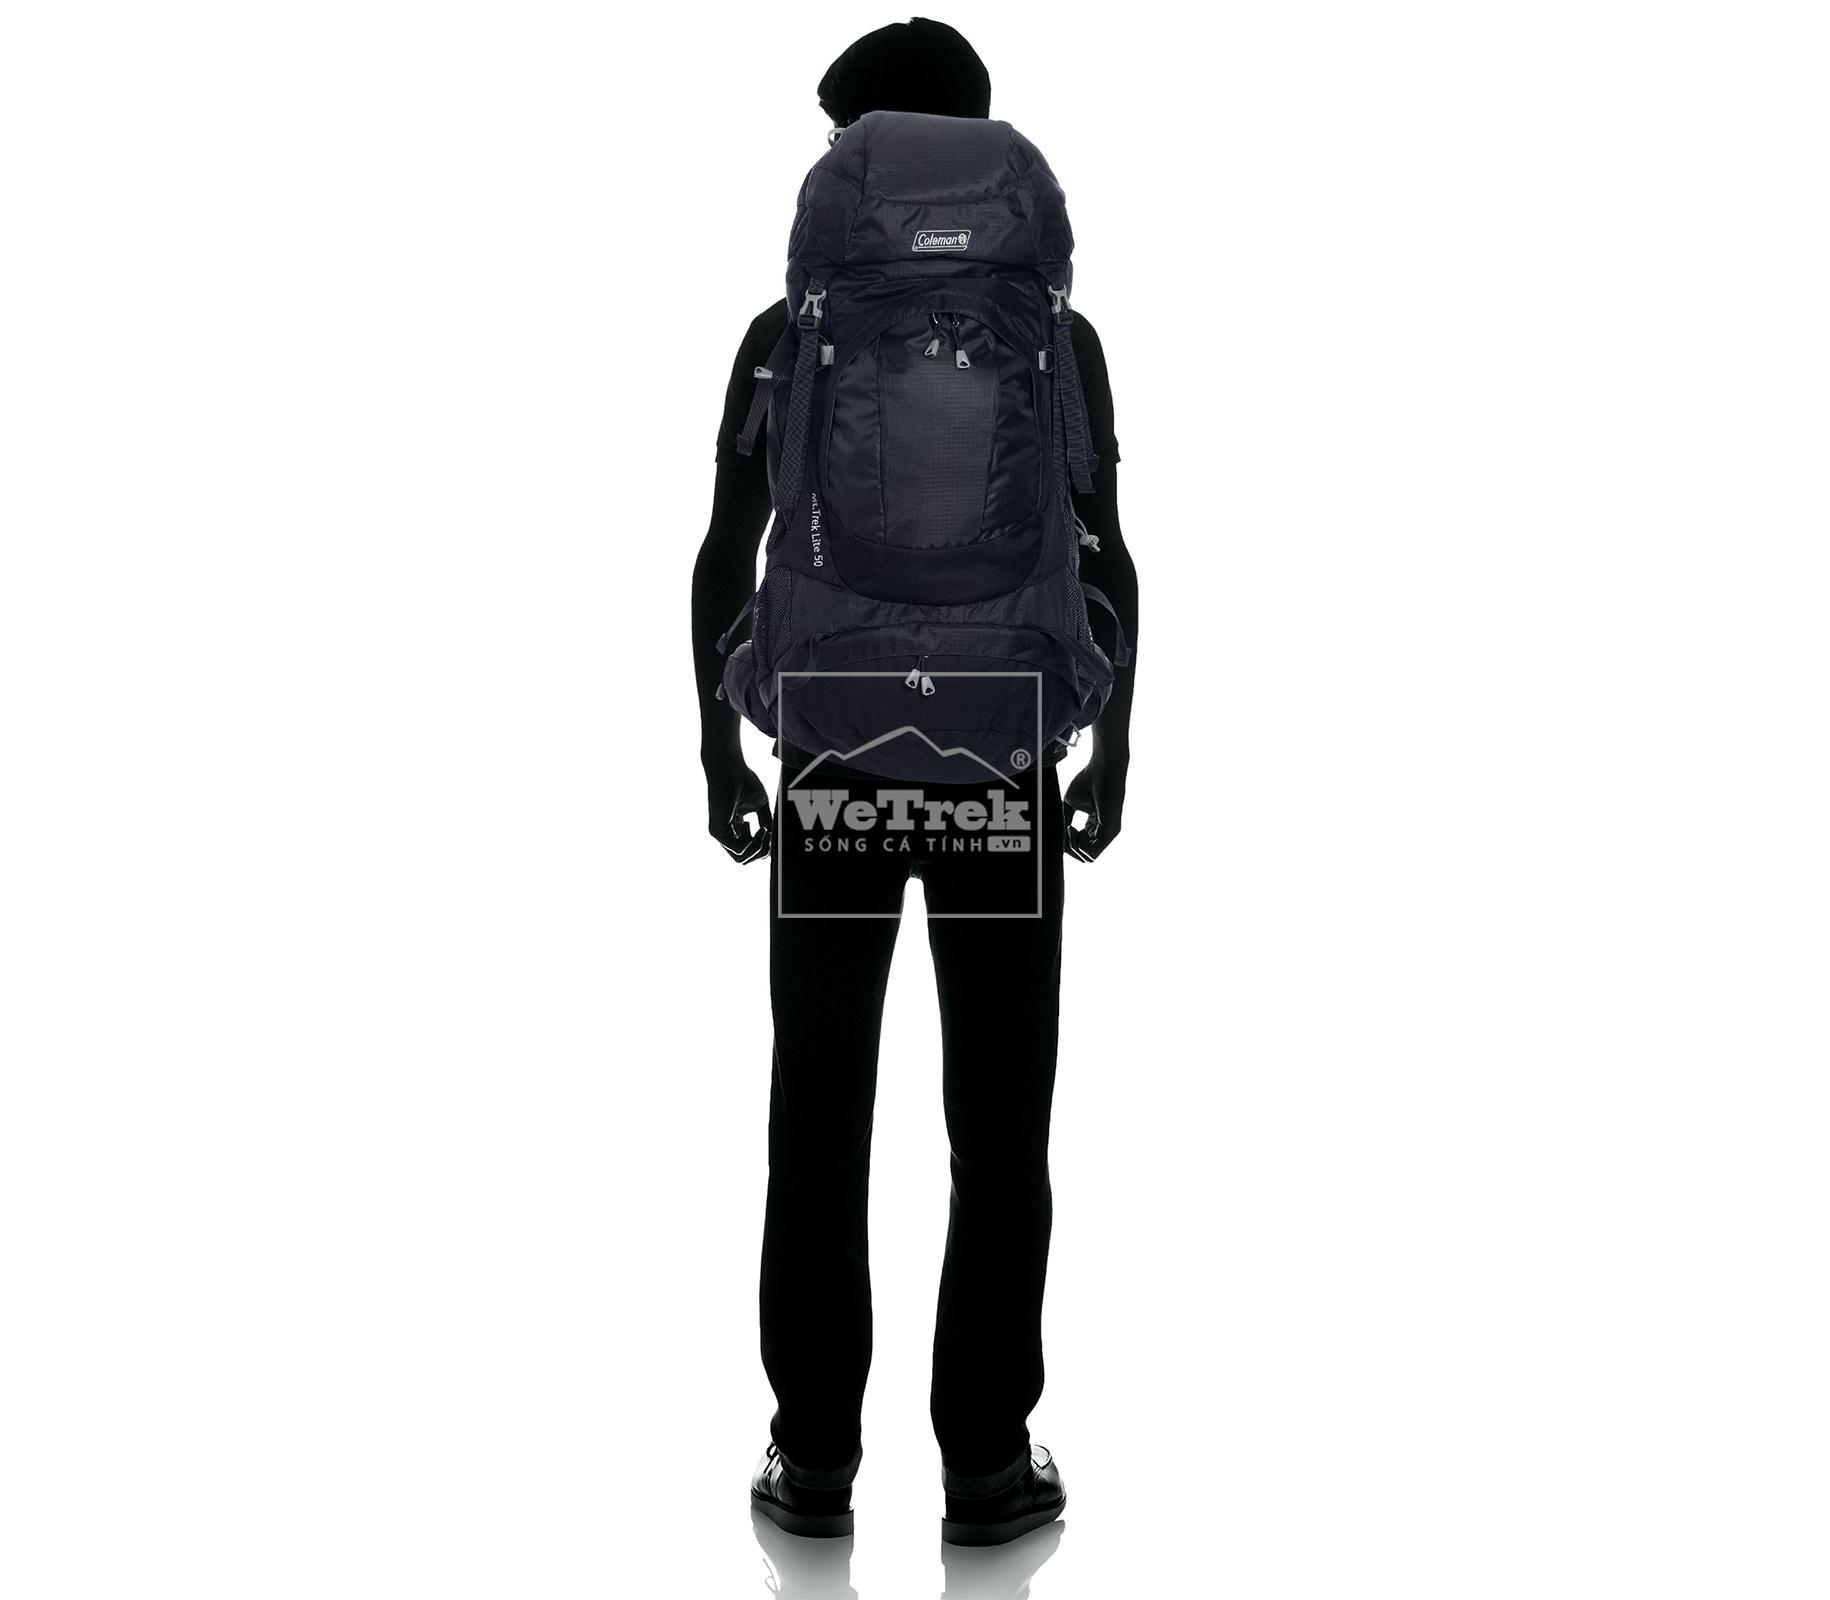 ba-lo-leo-nui-50l-coleman-mttrek-lite-backpack-black-cbb3491bk-7454-wetrek.vn-2